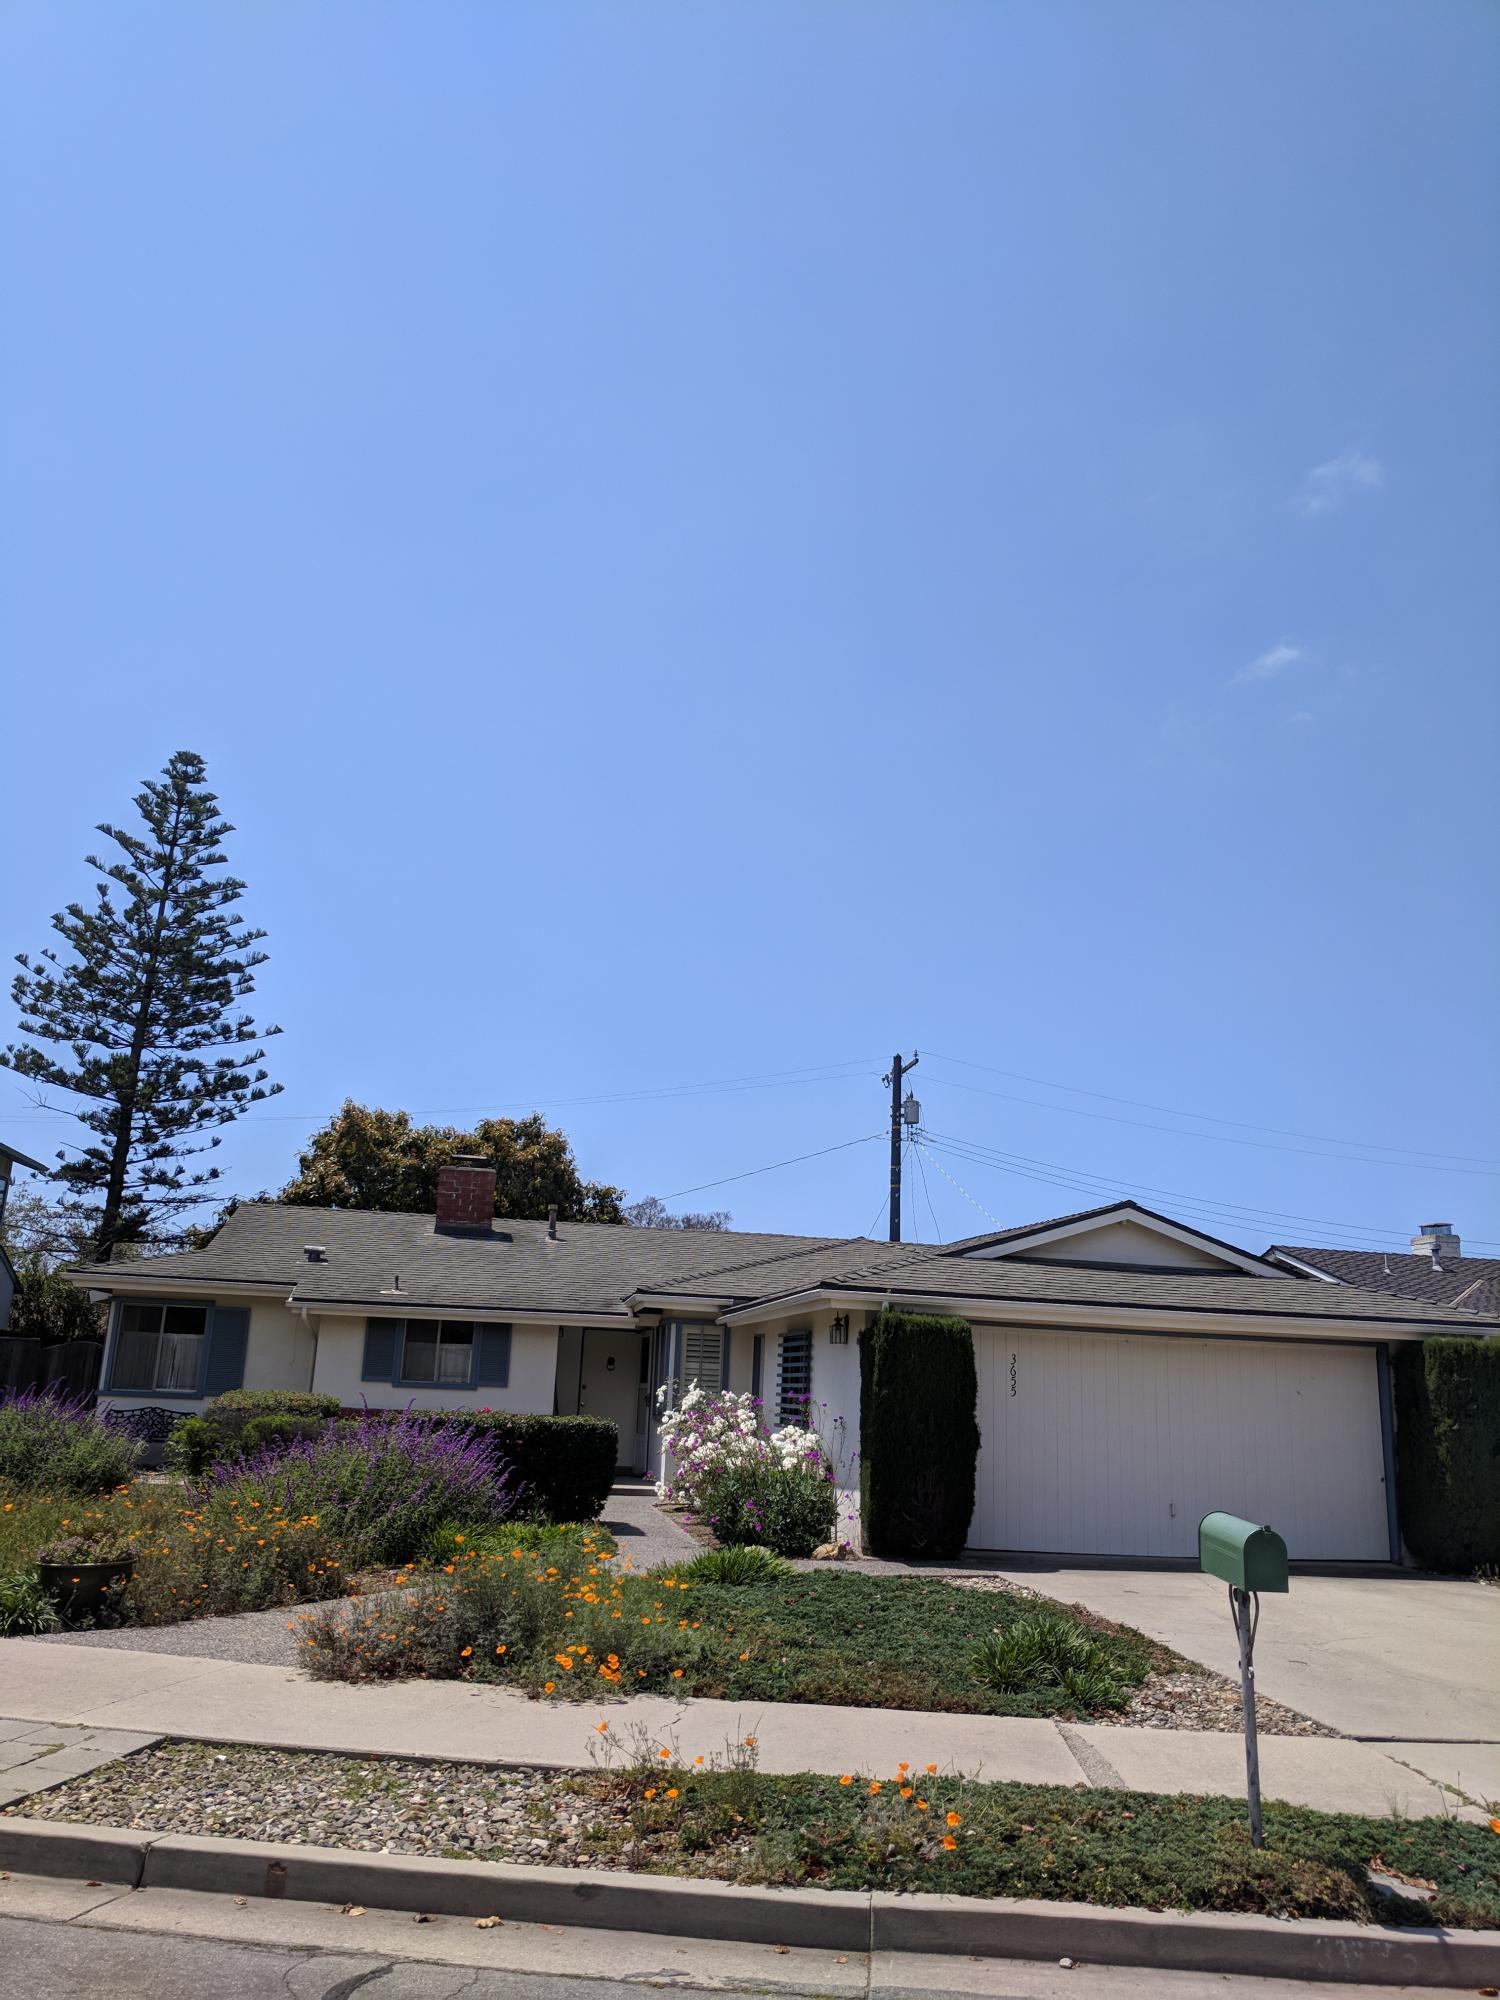 Property photo for 3655 Eileen Way Santa Barbara, California 93105 - RN-15210